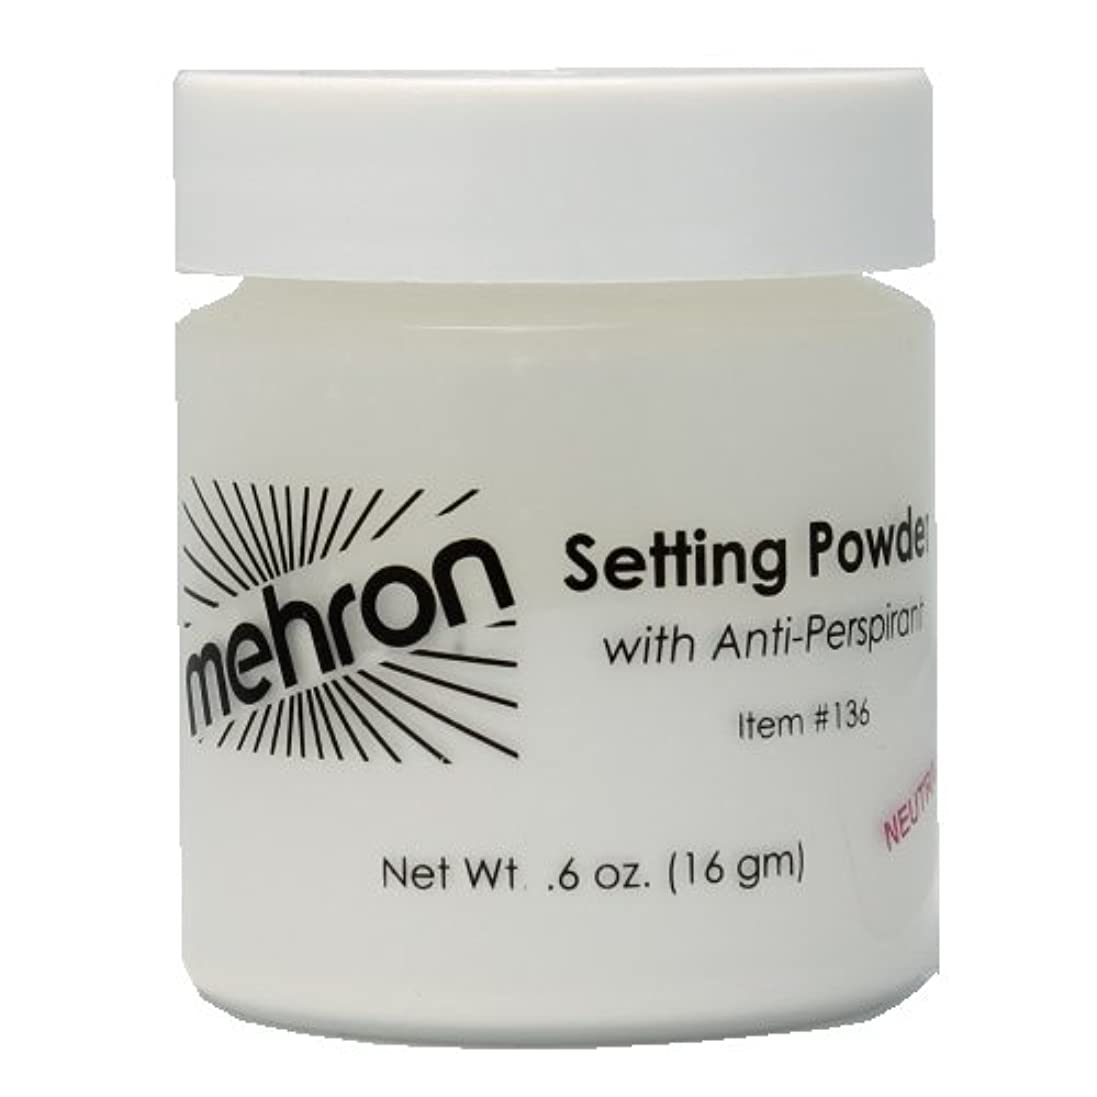 個人的な修道院保守可能(3 Pack) mehron UltraFine Setting Powder with Anti-Perspriant - Neutral (並行輸入品)